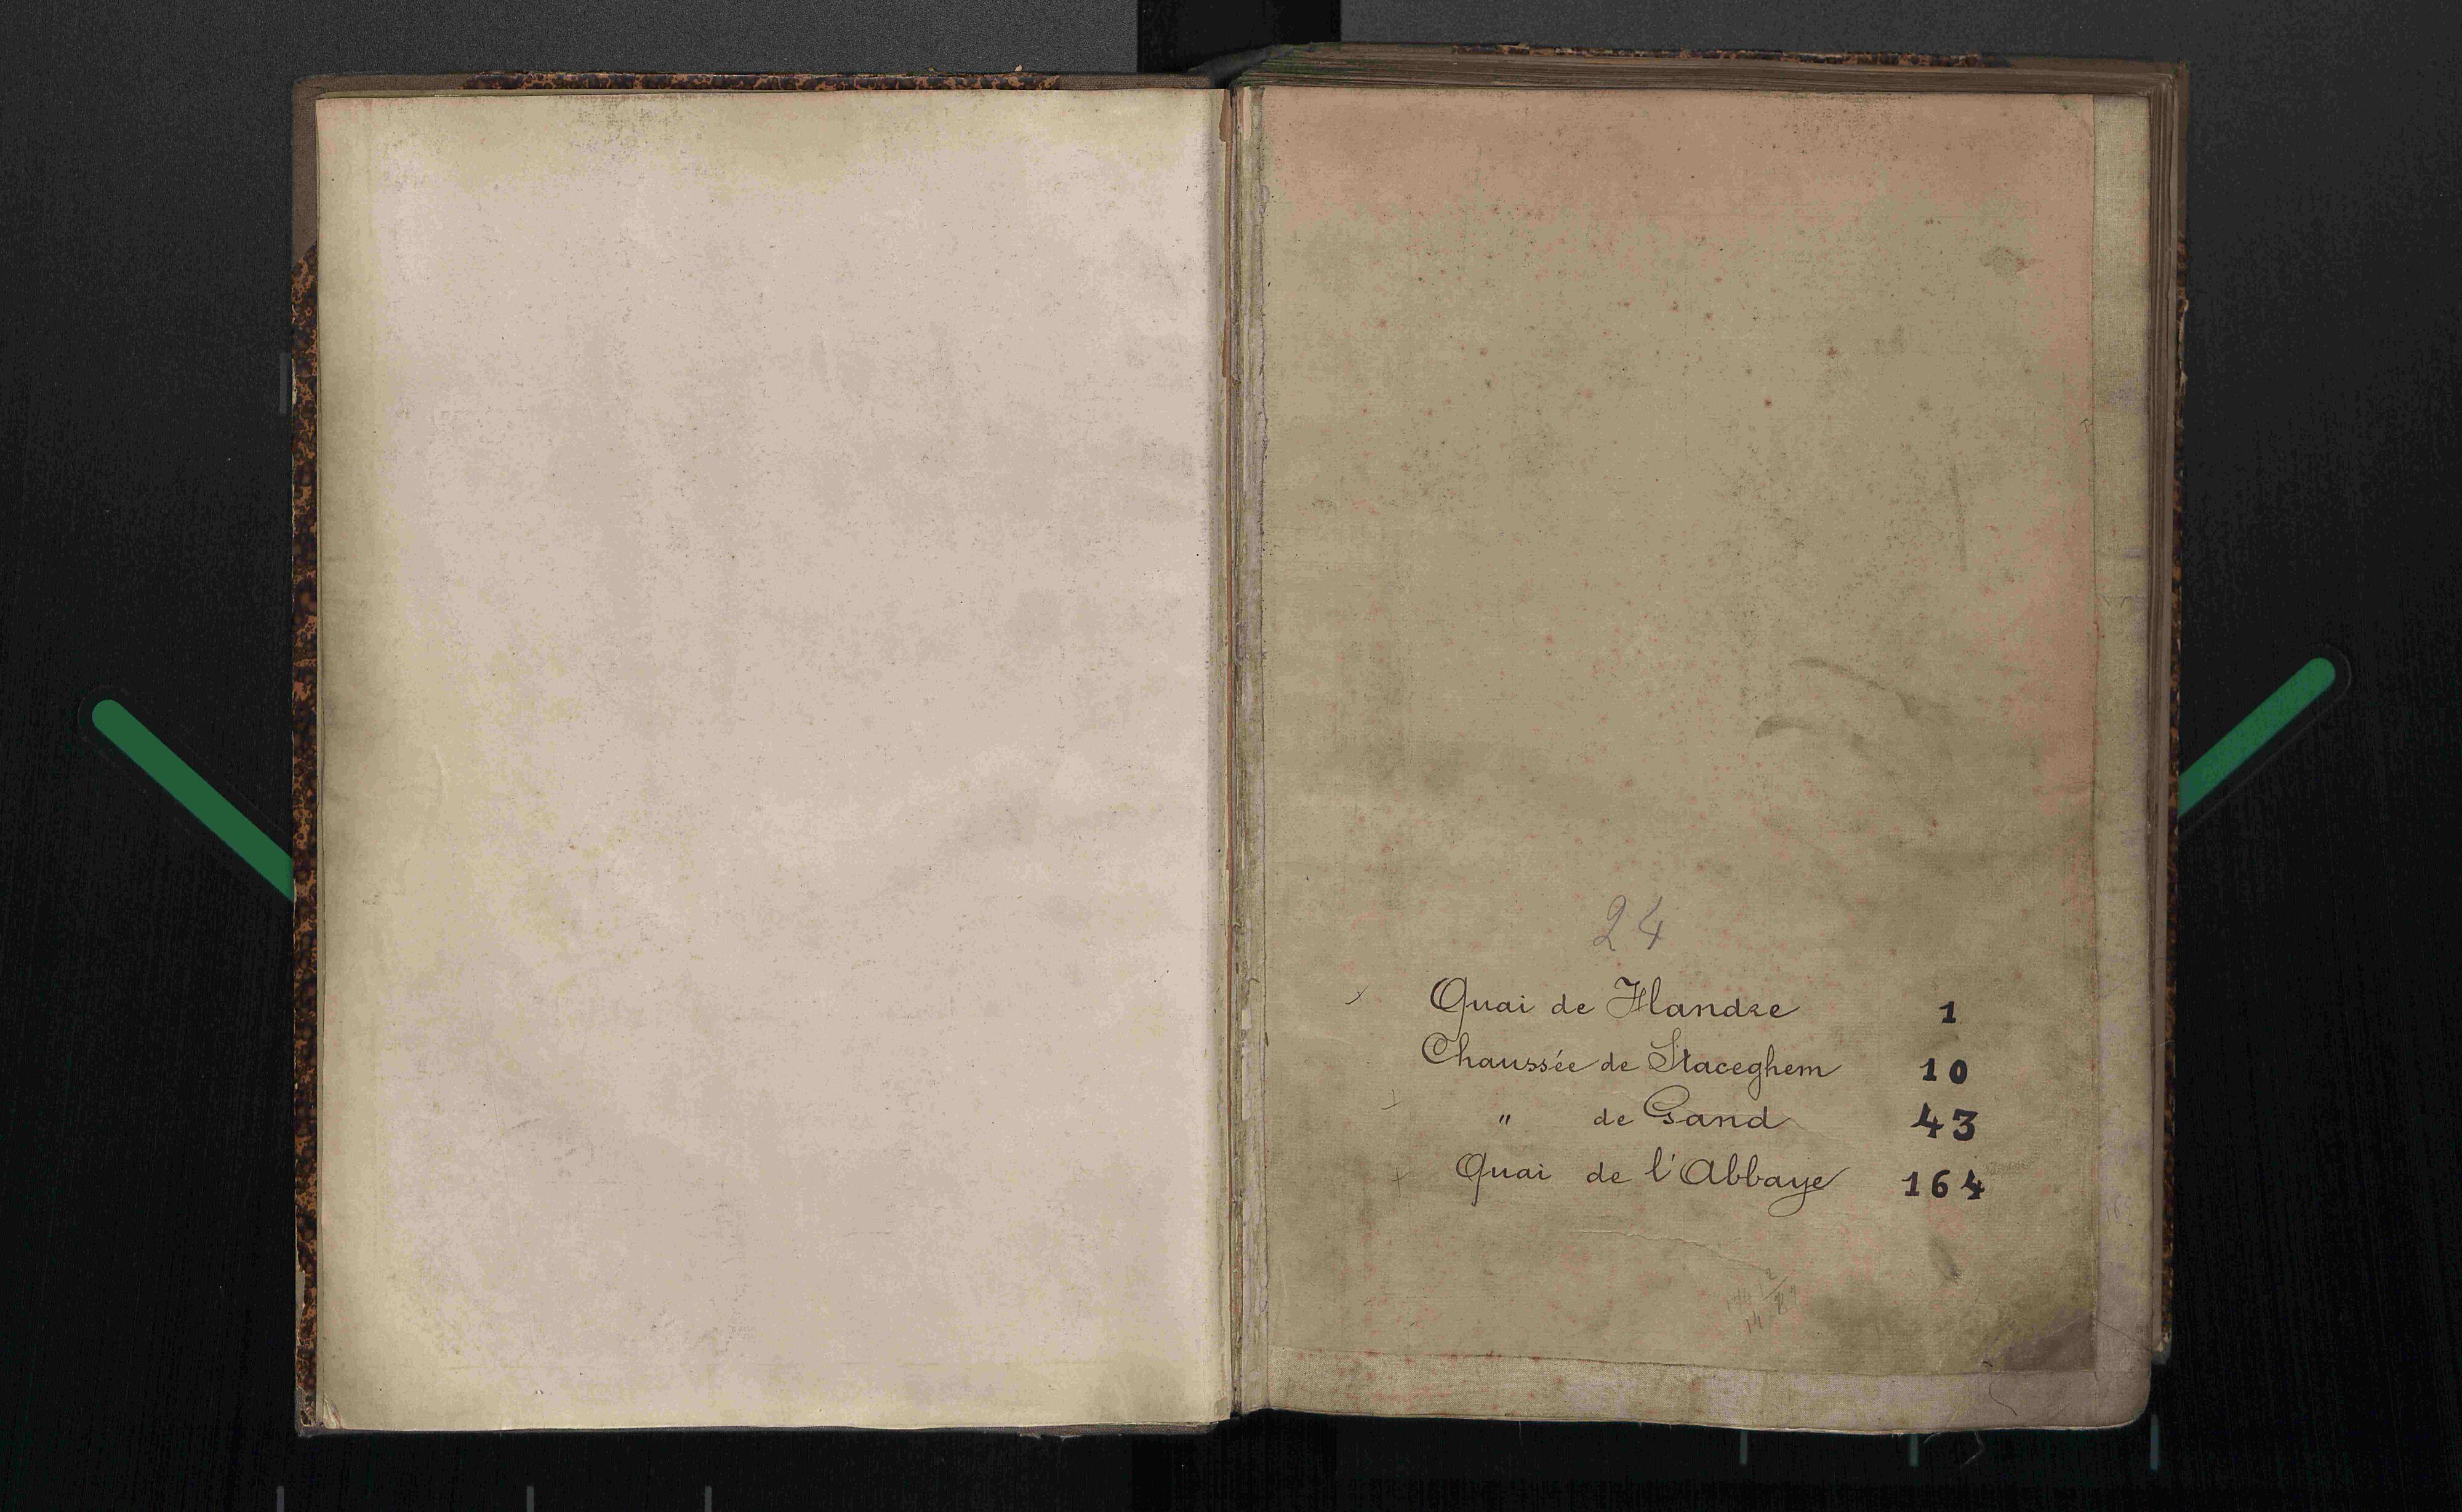 Bevolkingsregister Kortrijk 1890 boek 24